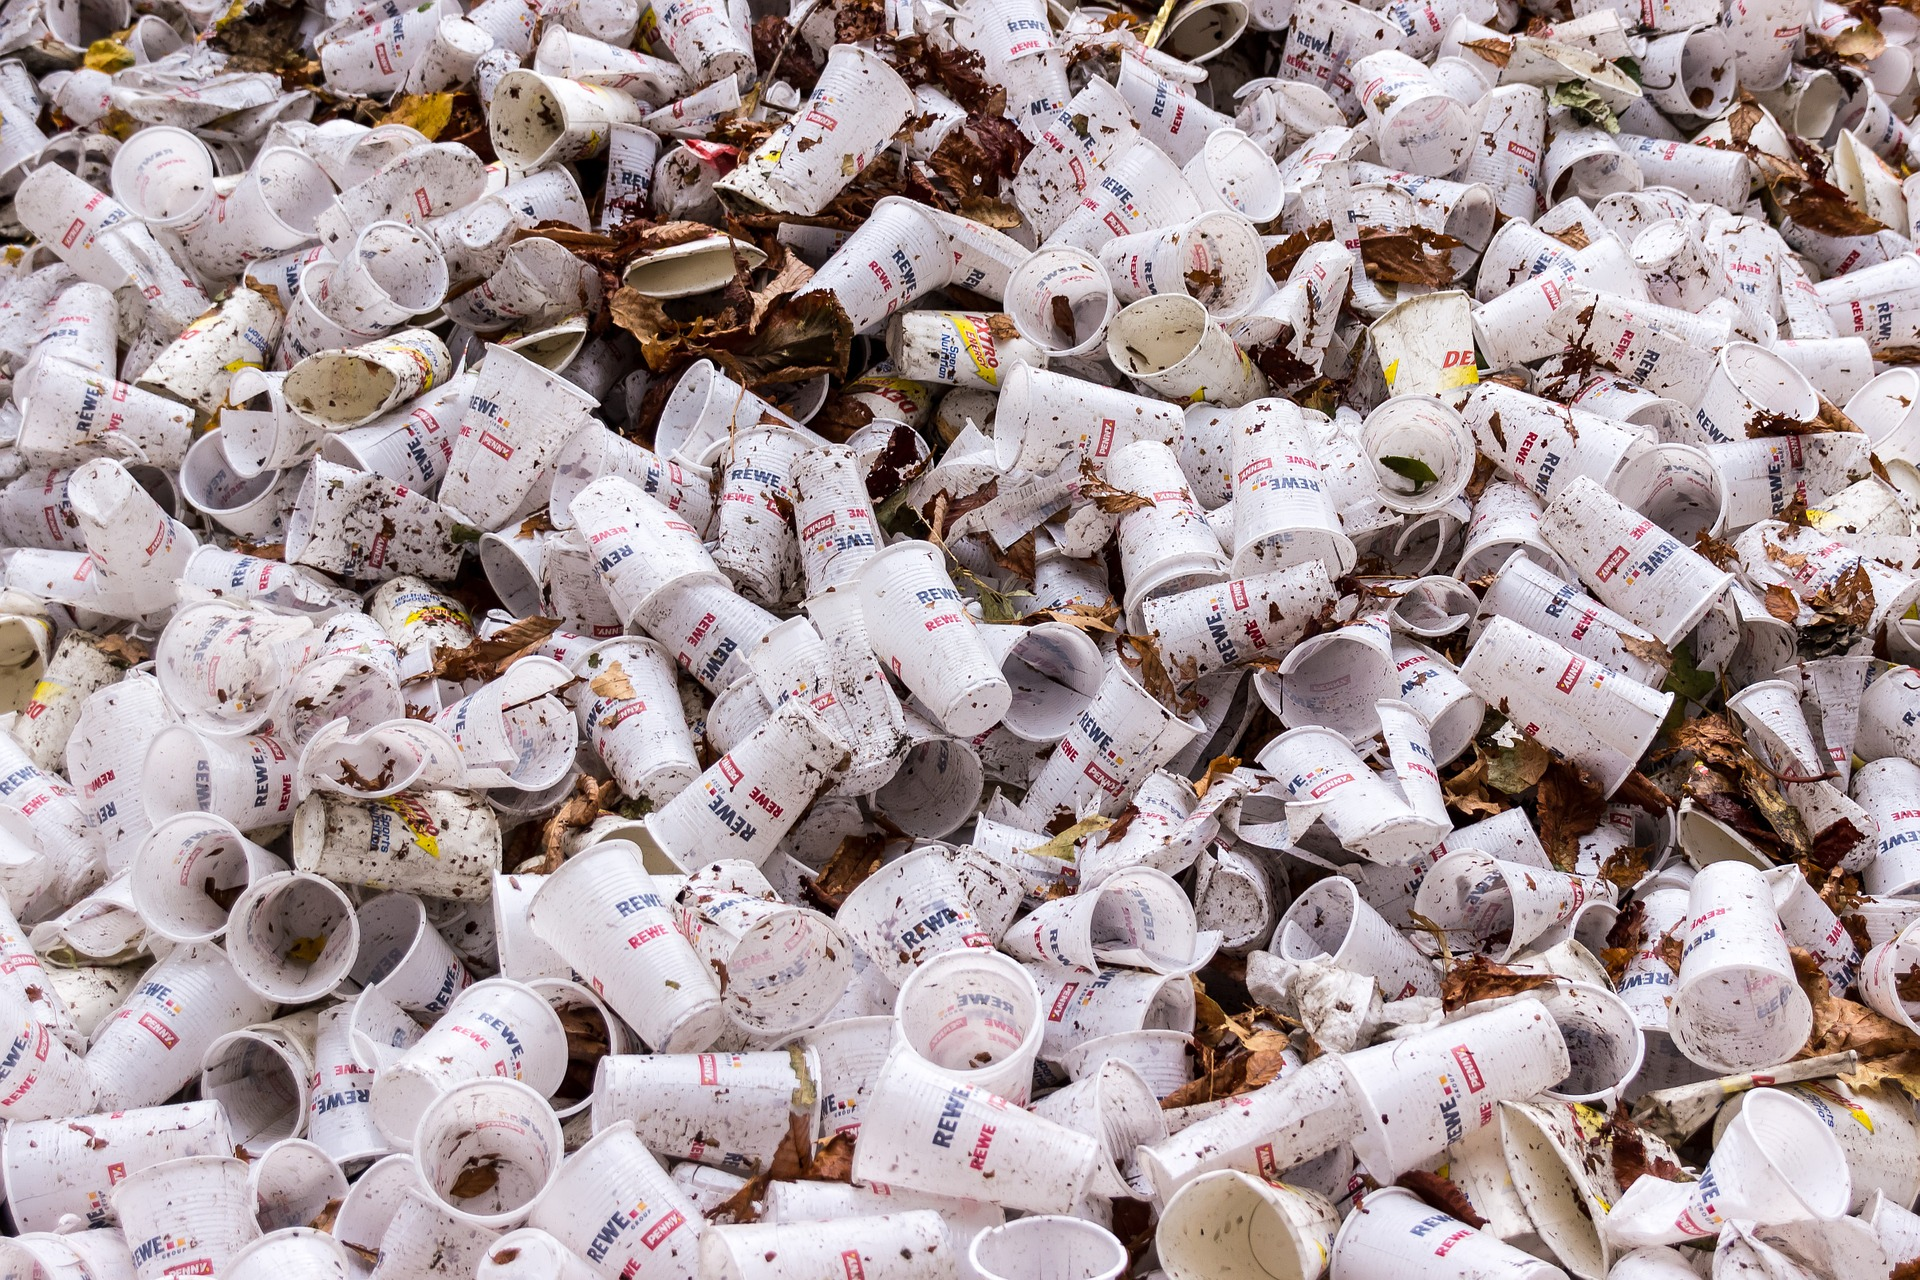 contenedor-de-reciclaje-plastico